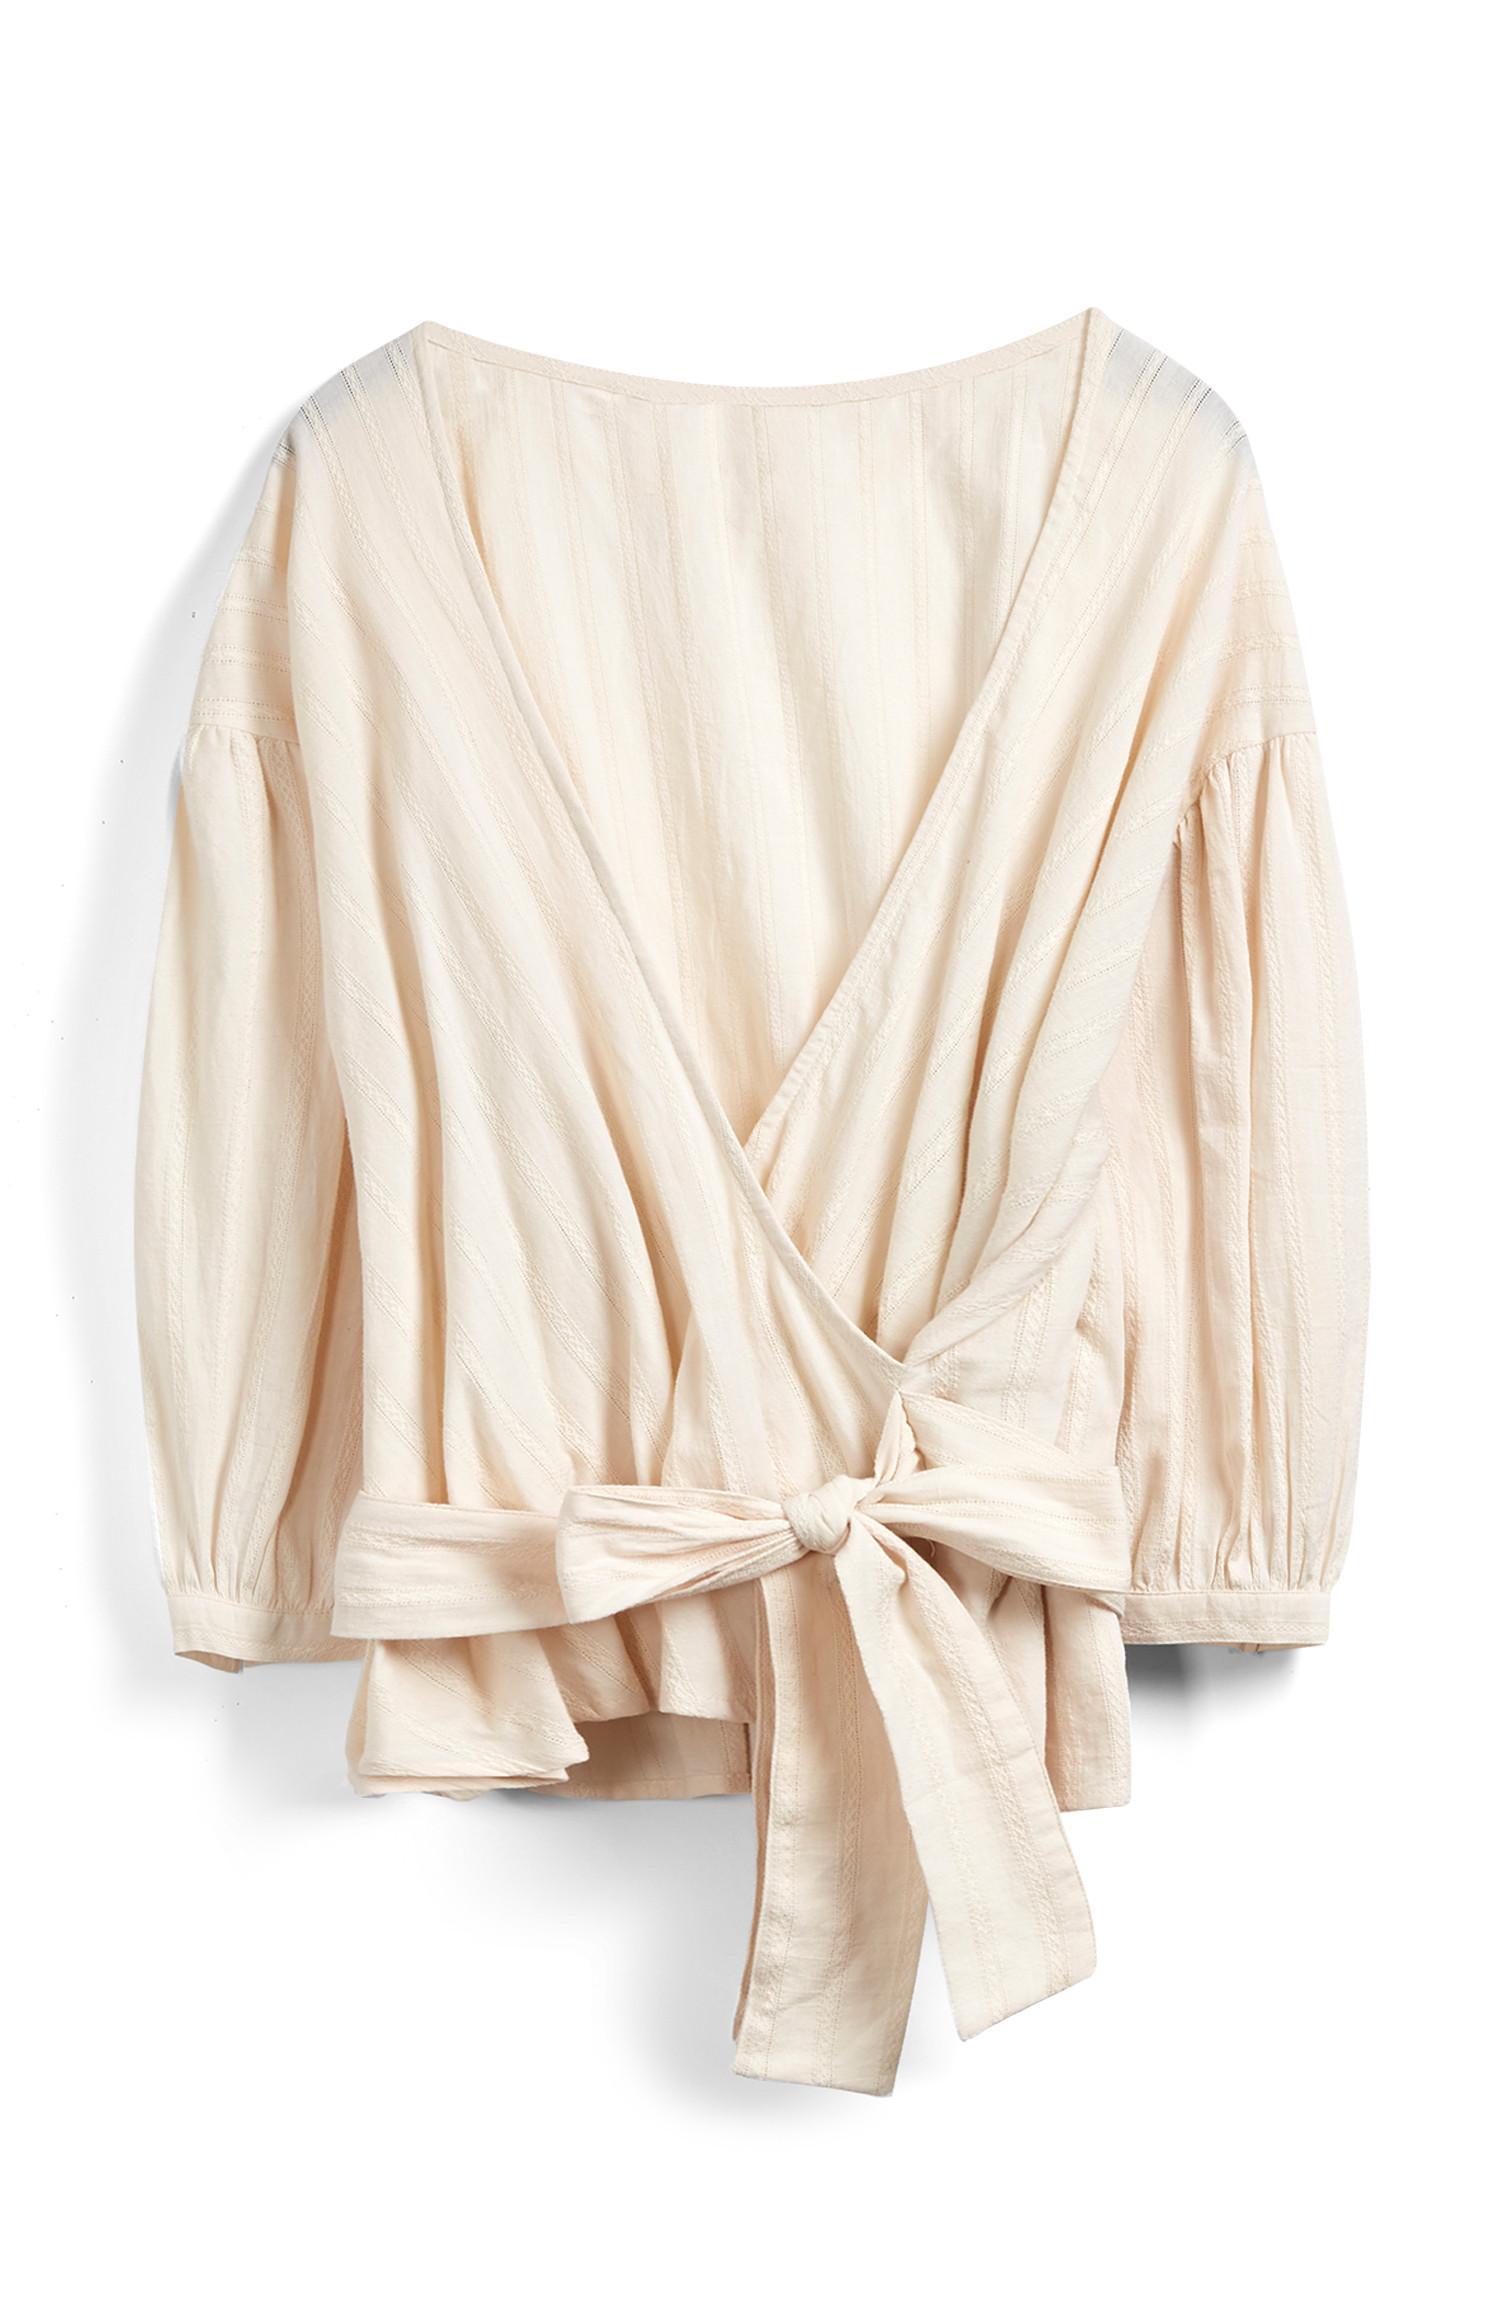 Ivory Wrap Top